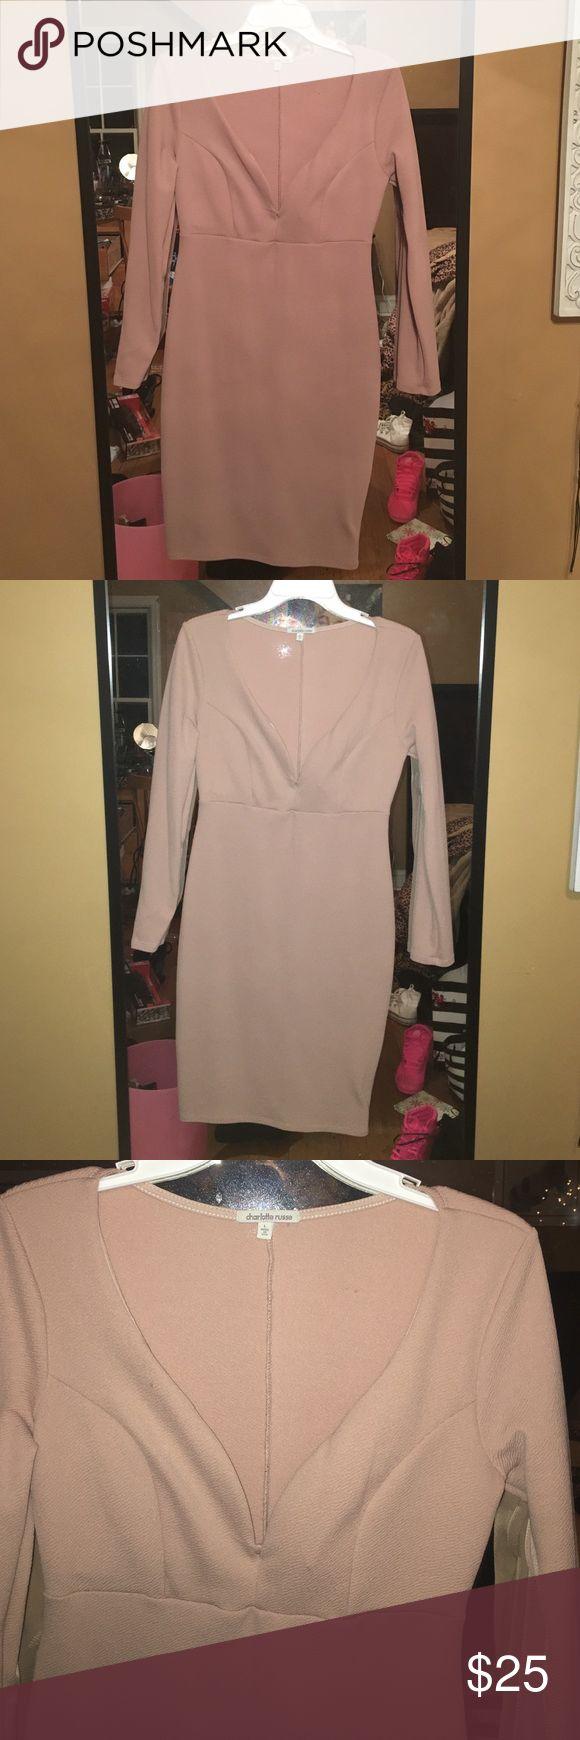 Charlotte Russe dress Tan/nude long sleeve low cut going out party dress. Charlotte Russe Dresses Mini